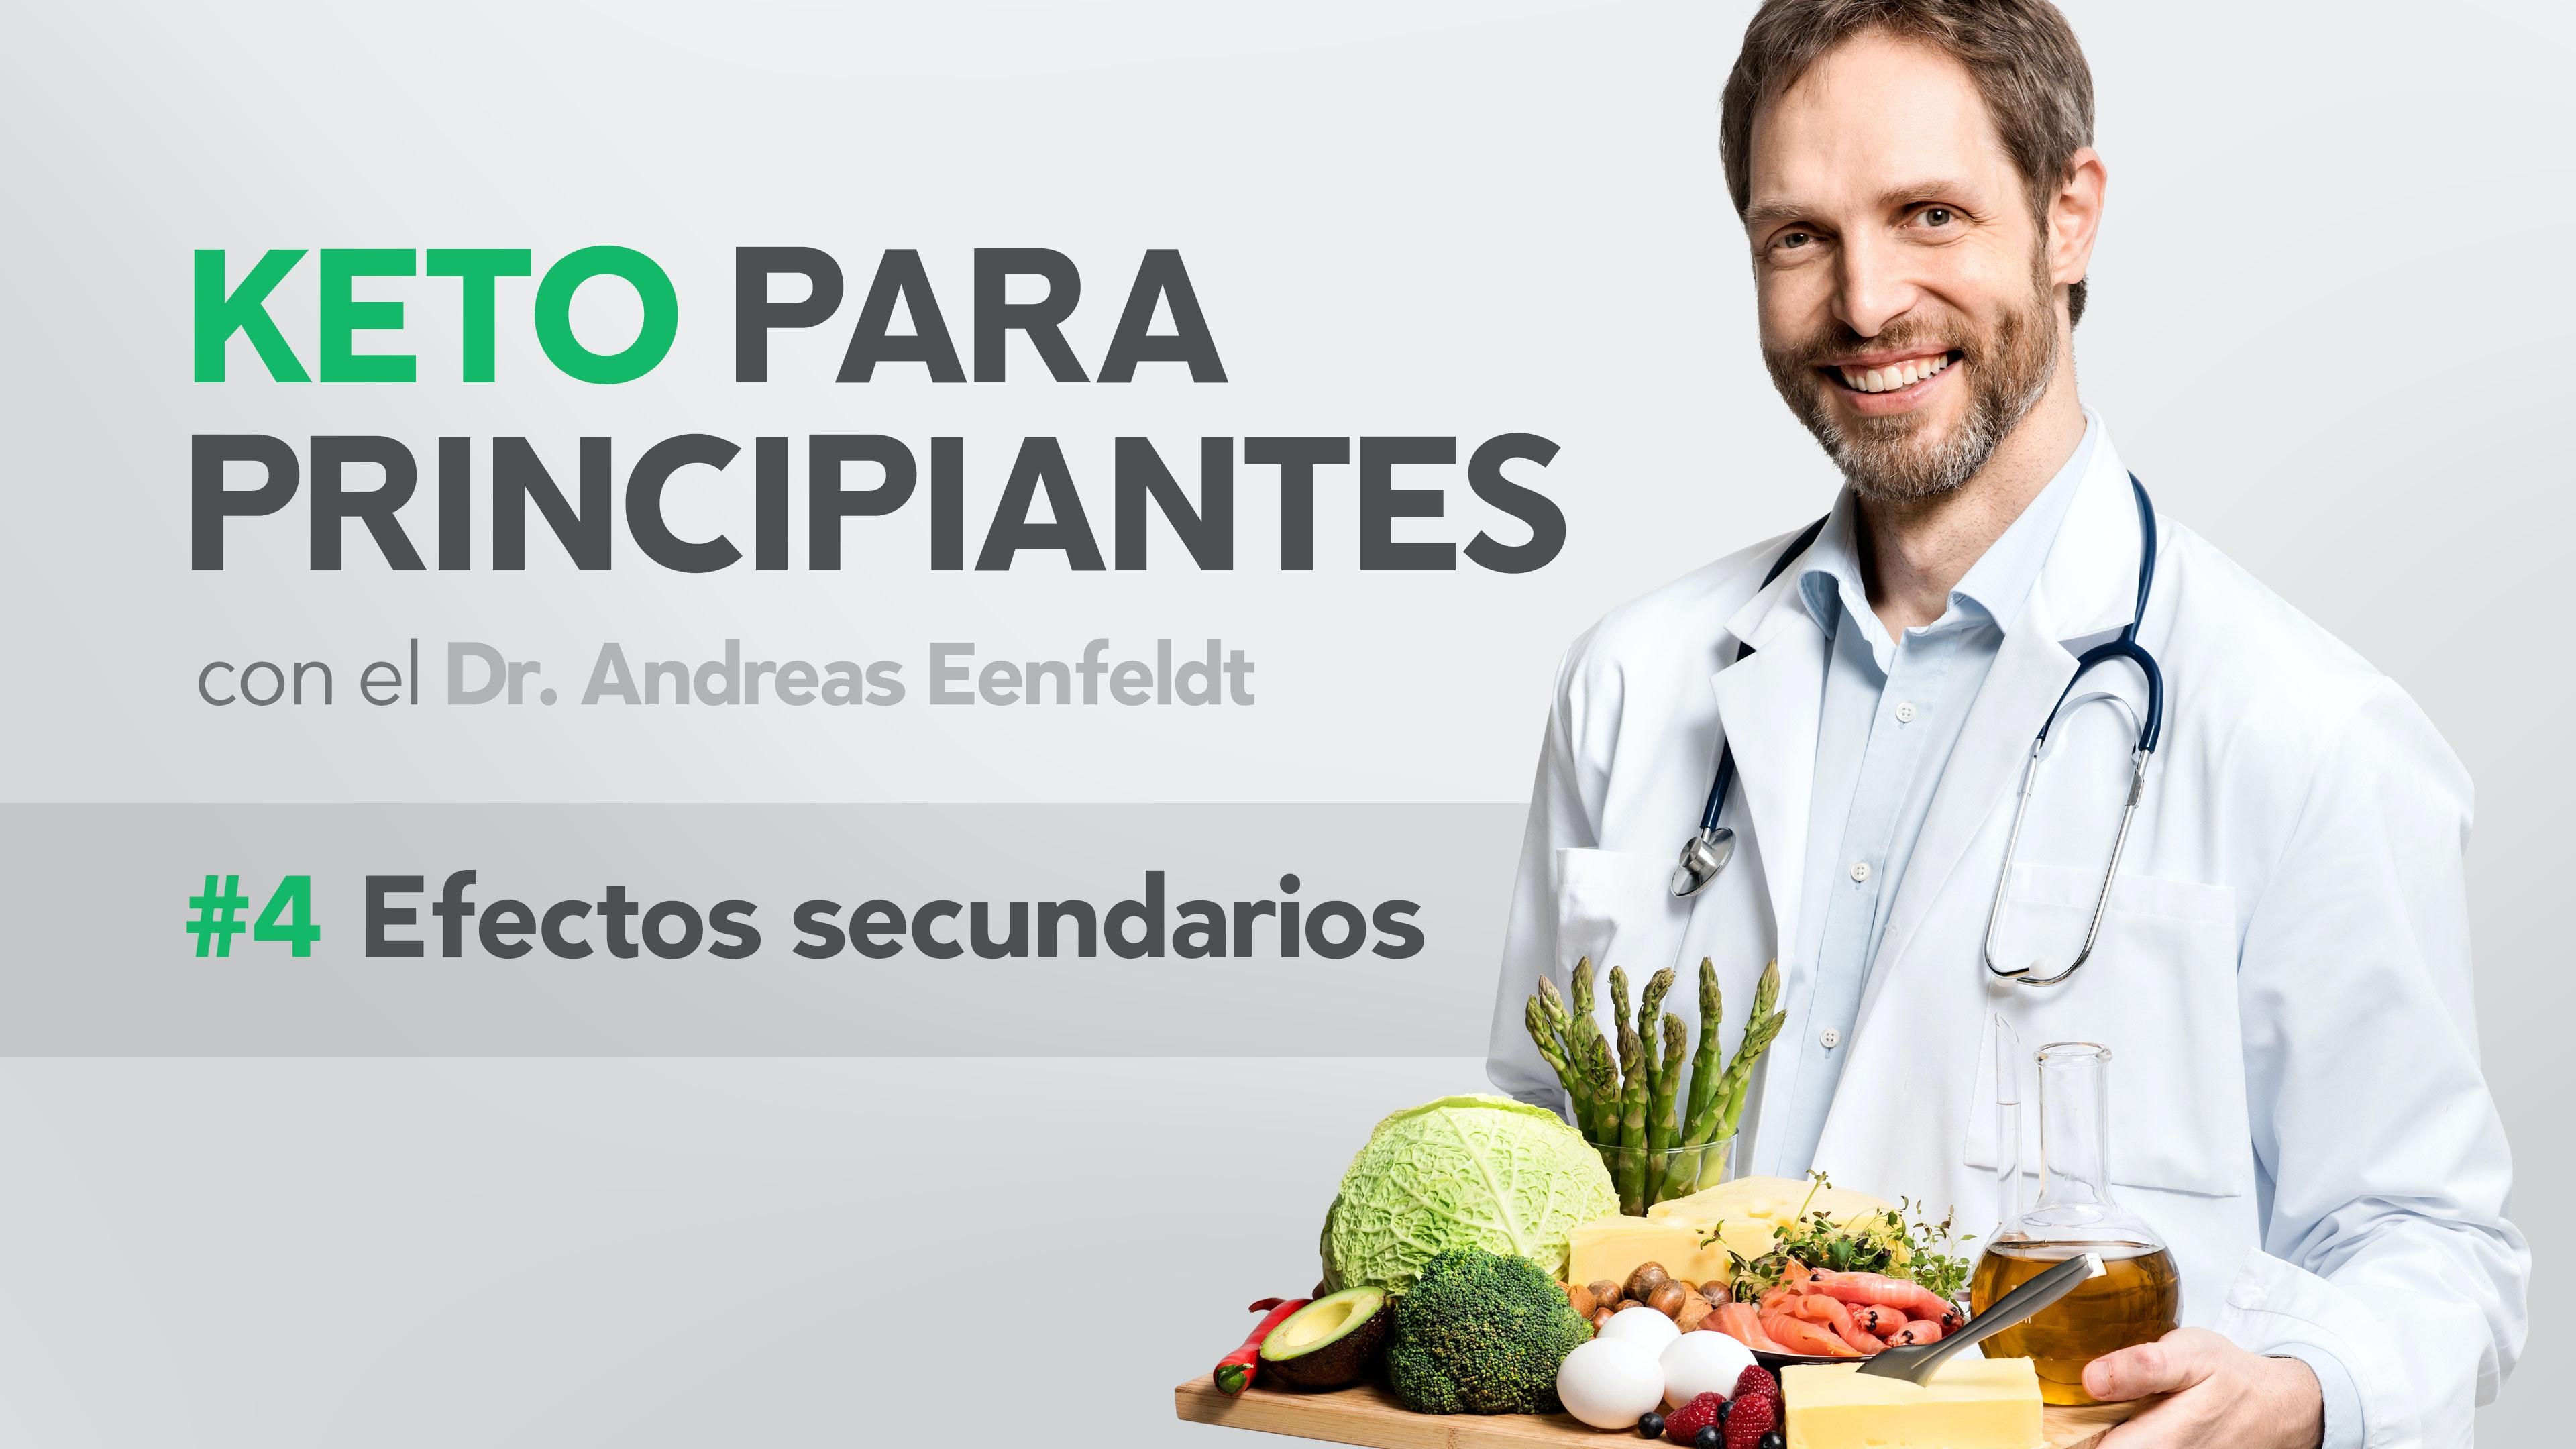 Contraindicaciones de la dieta cetogenica